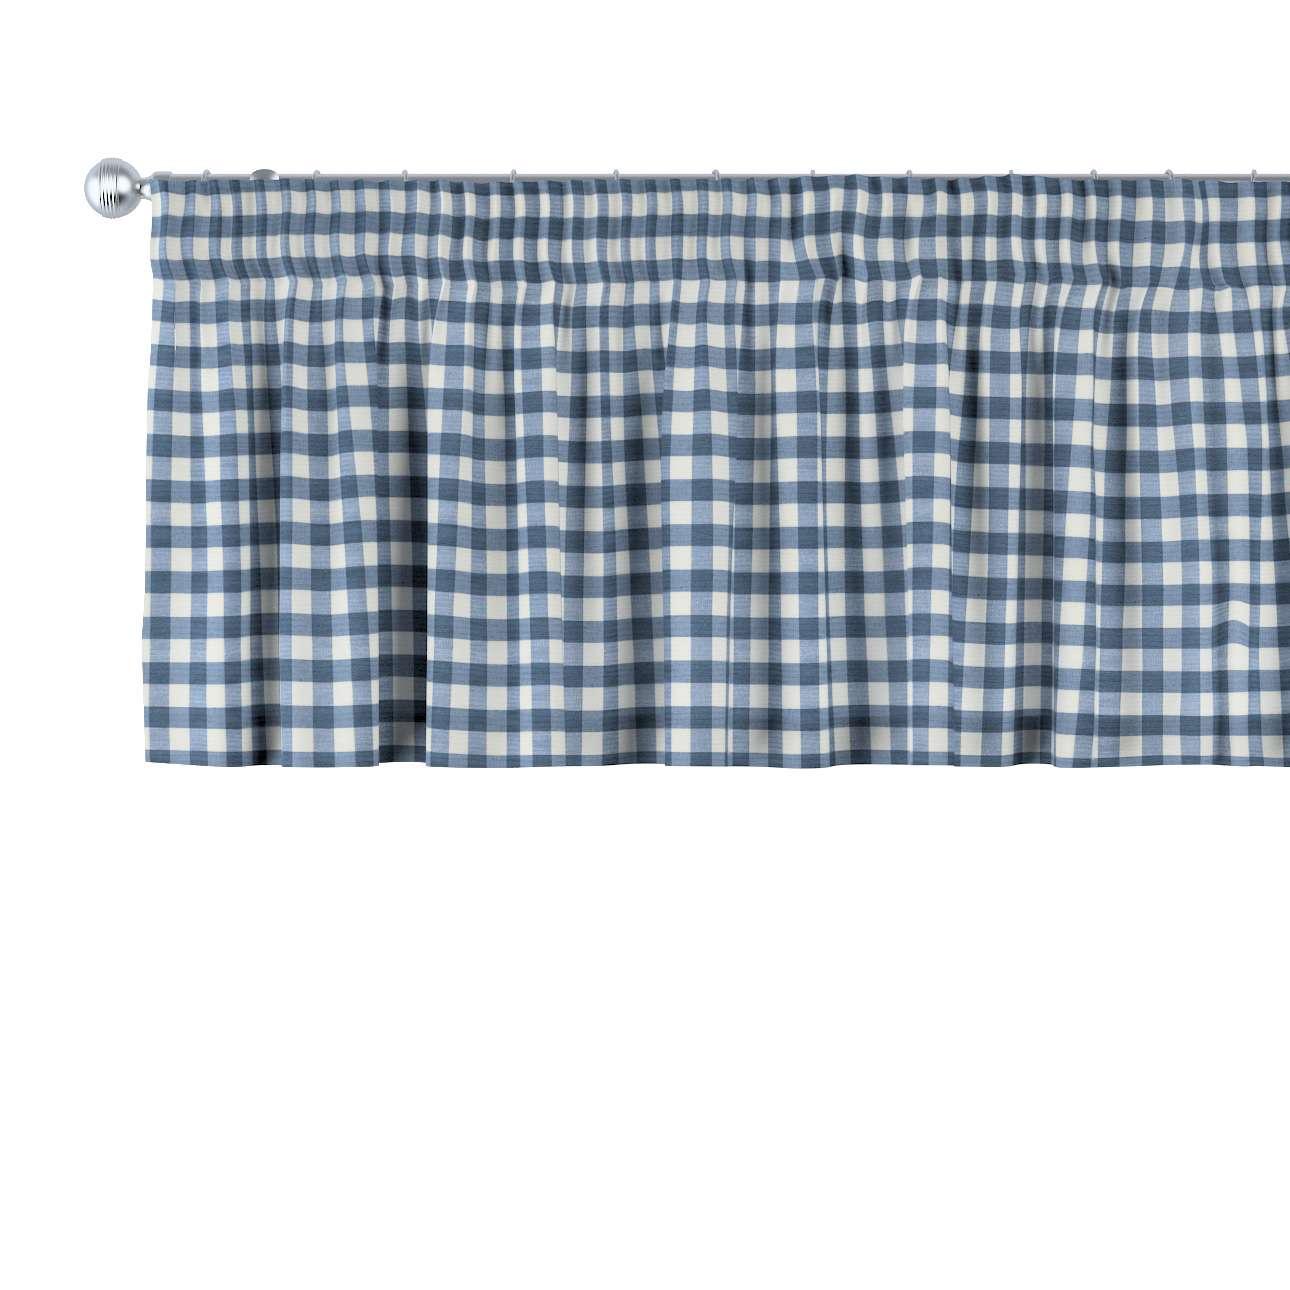 Quadro 136-01 V kolekcii Quadro, tkanina: 136-01